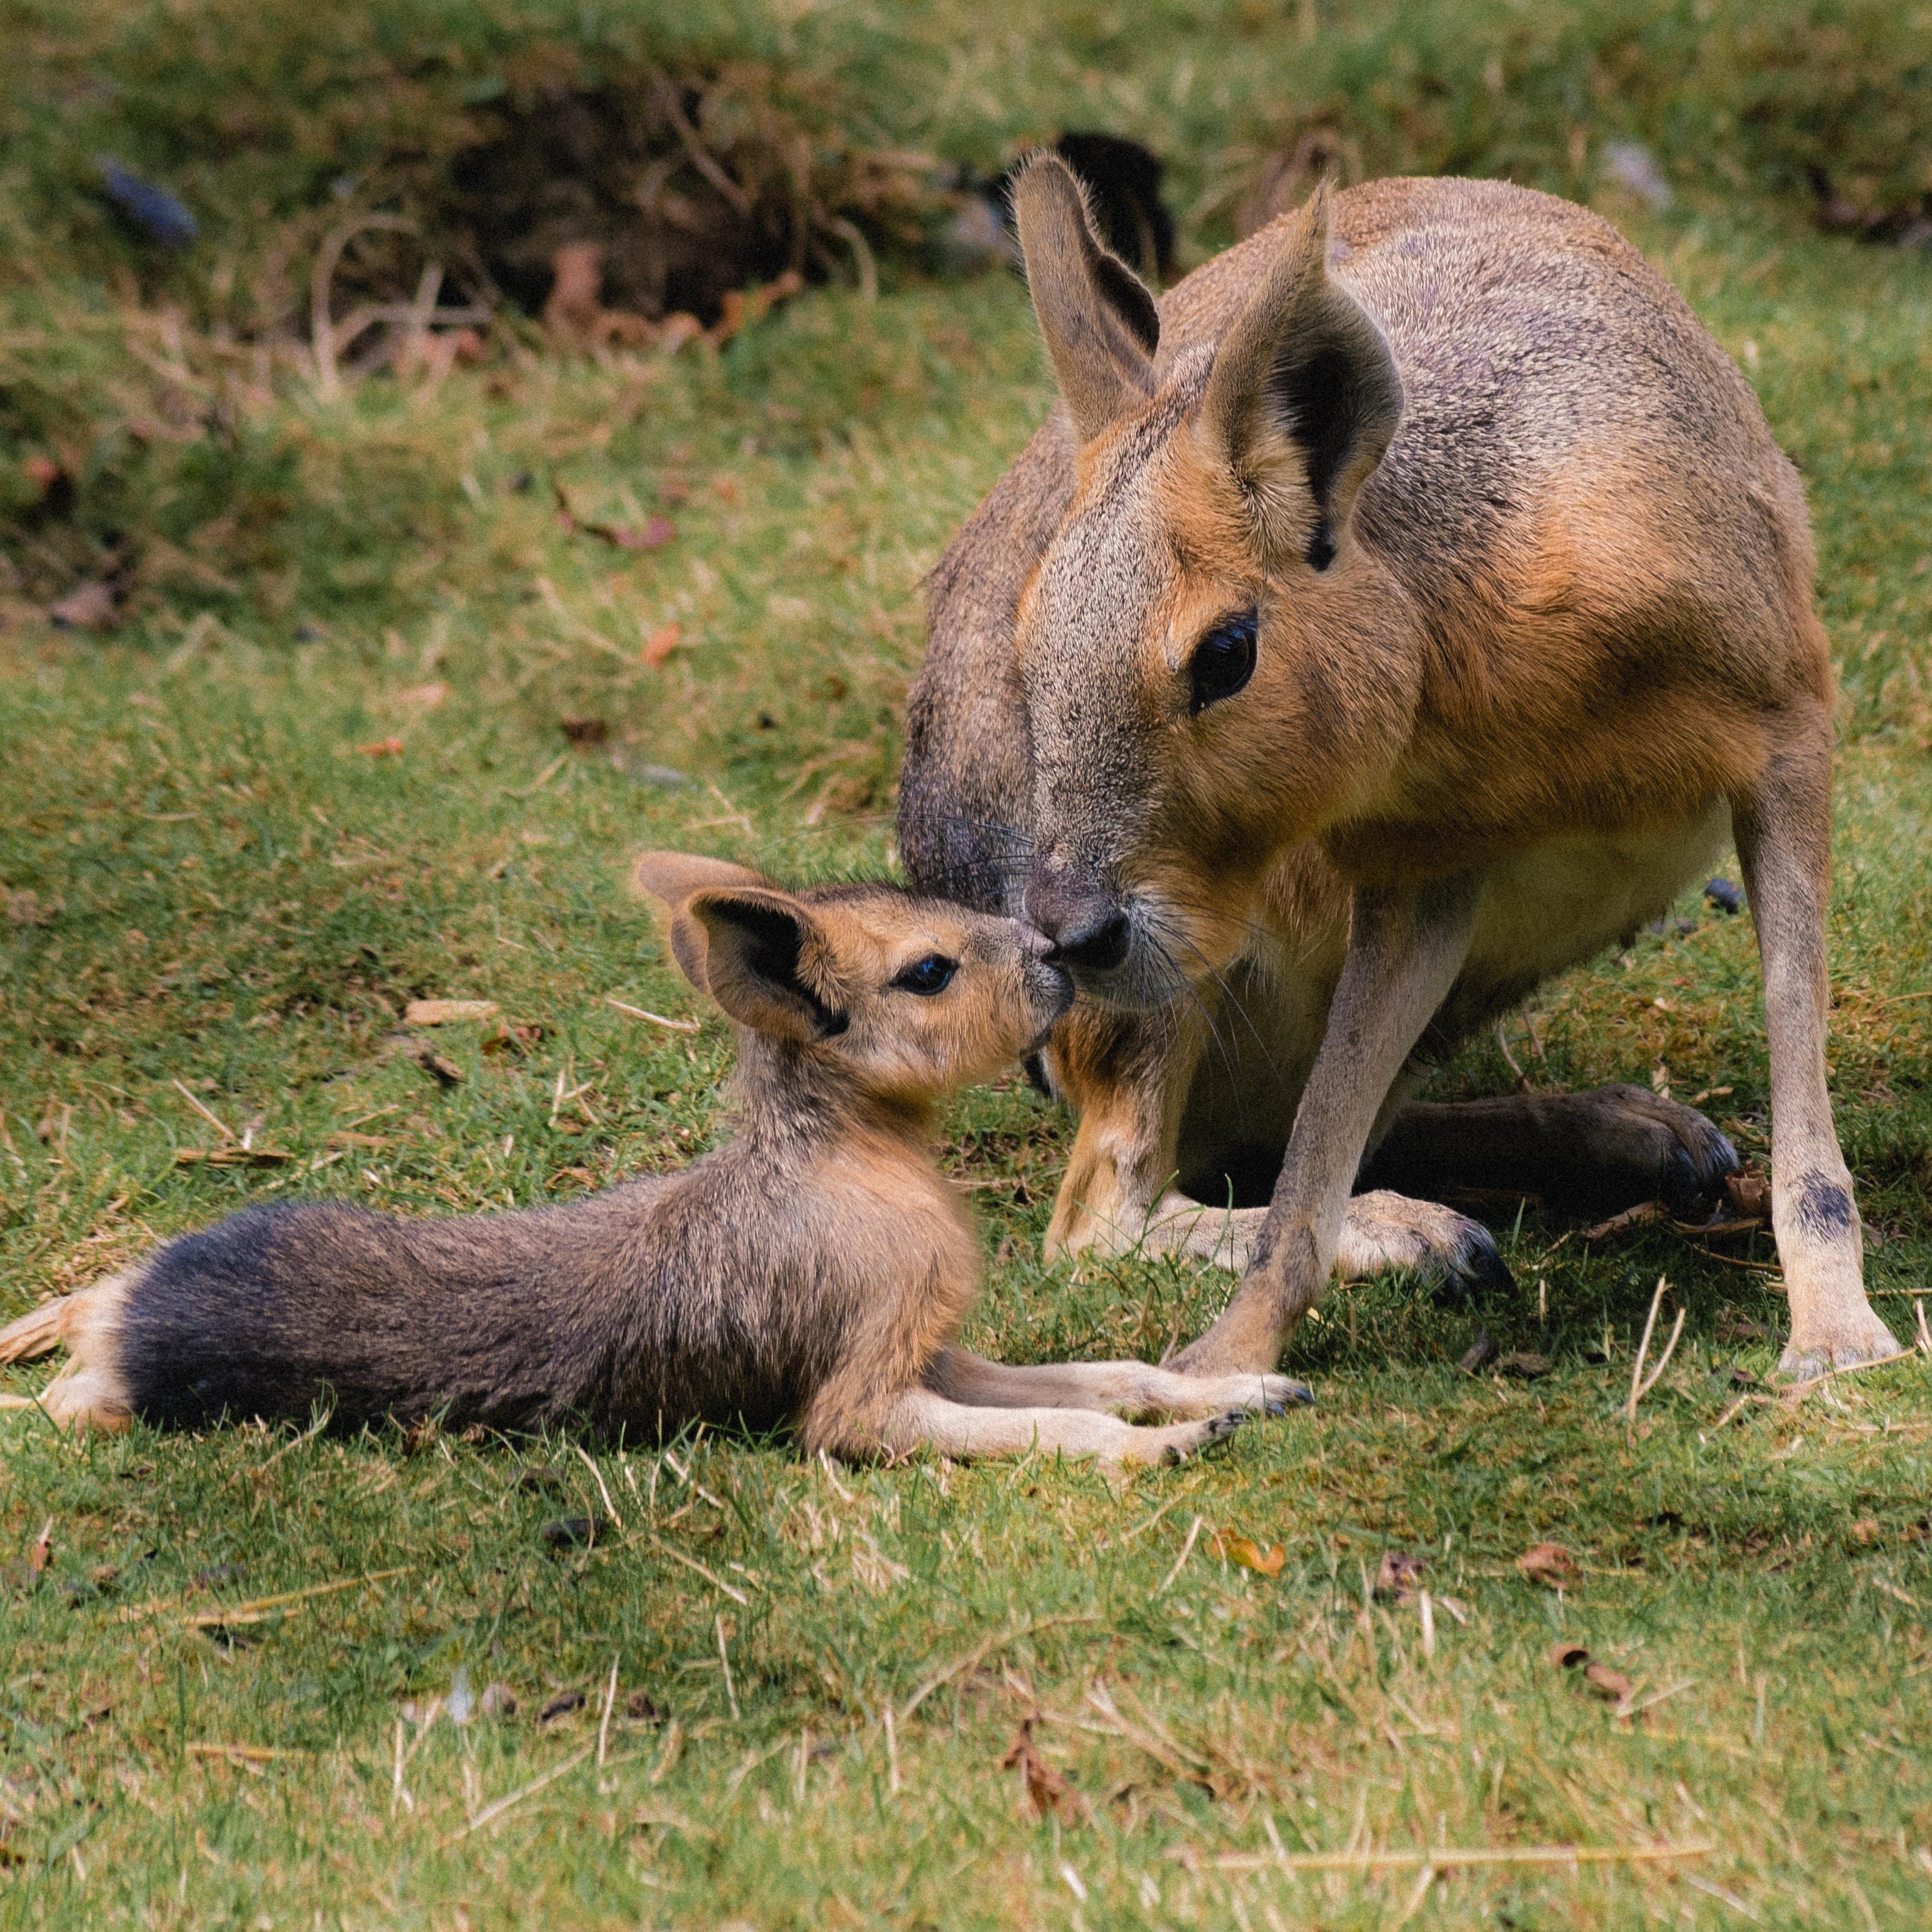 Mara, Patagonian Hare, Patagonian Cavy or Dillaby